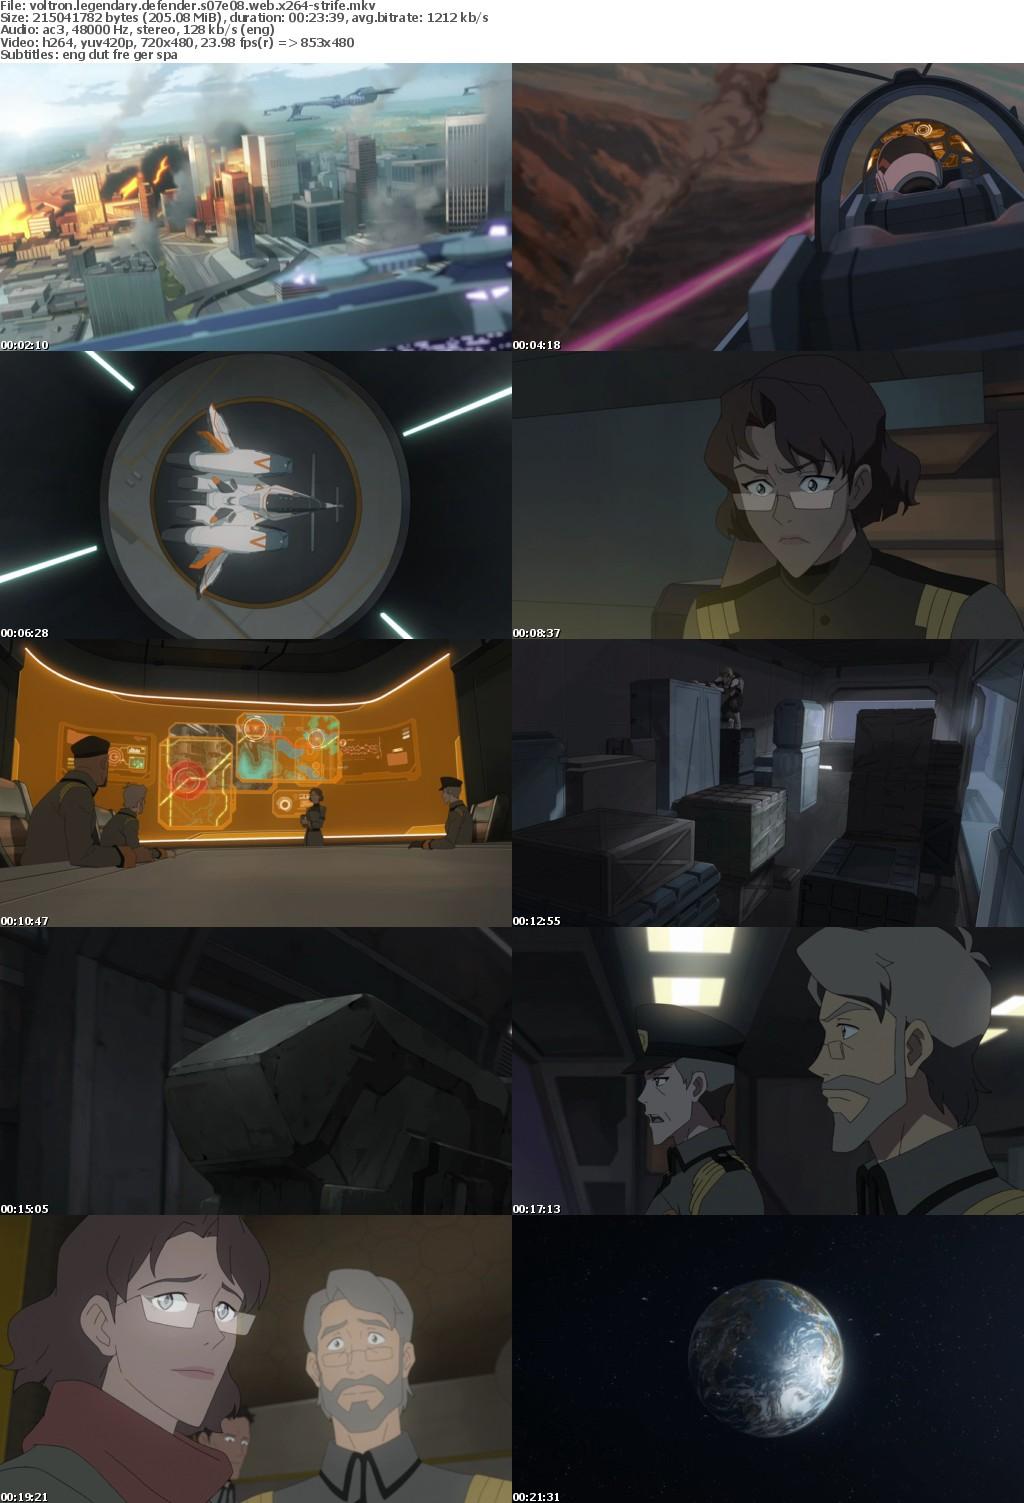 Voltron Legendary Defender S07E08 WEB x264-STRiFE